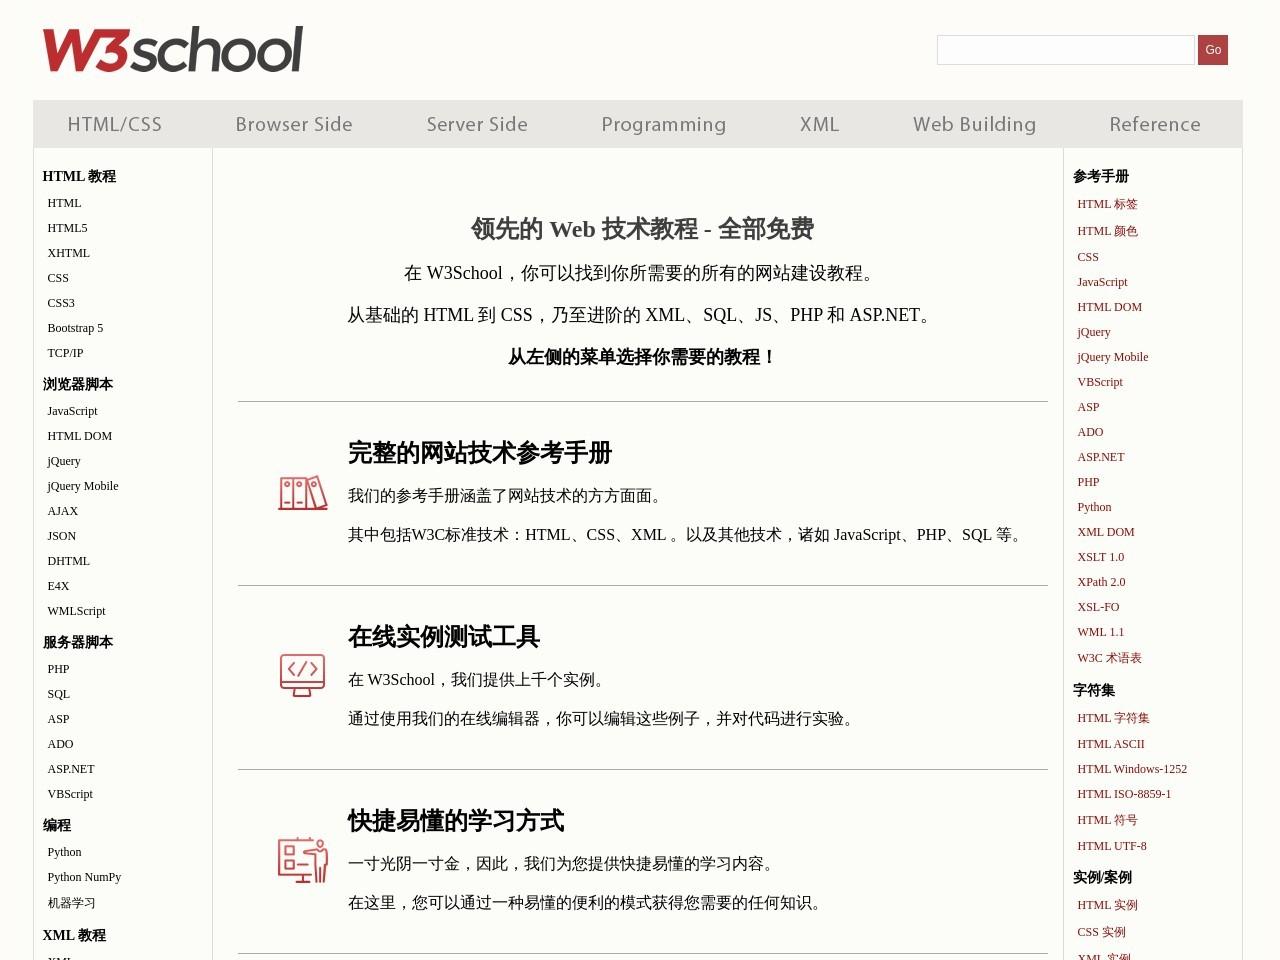 w3school 在线教程截图